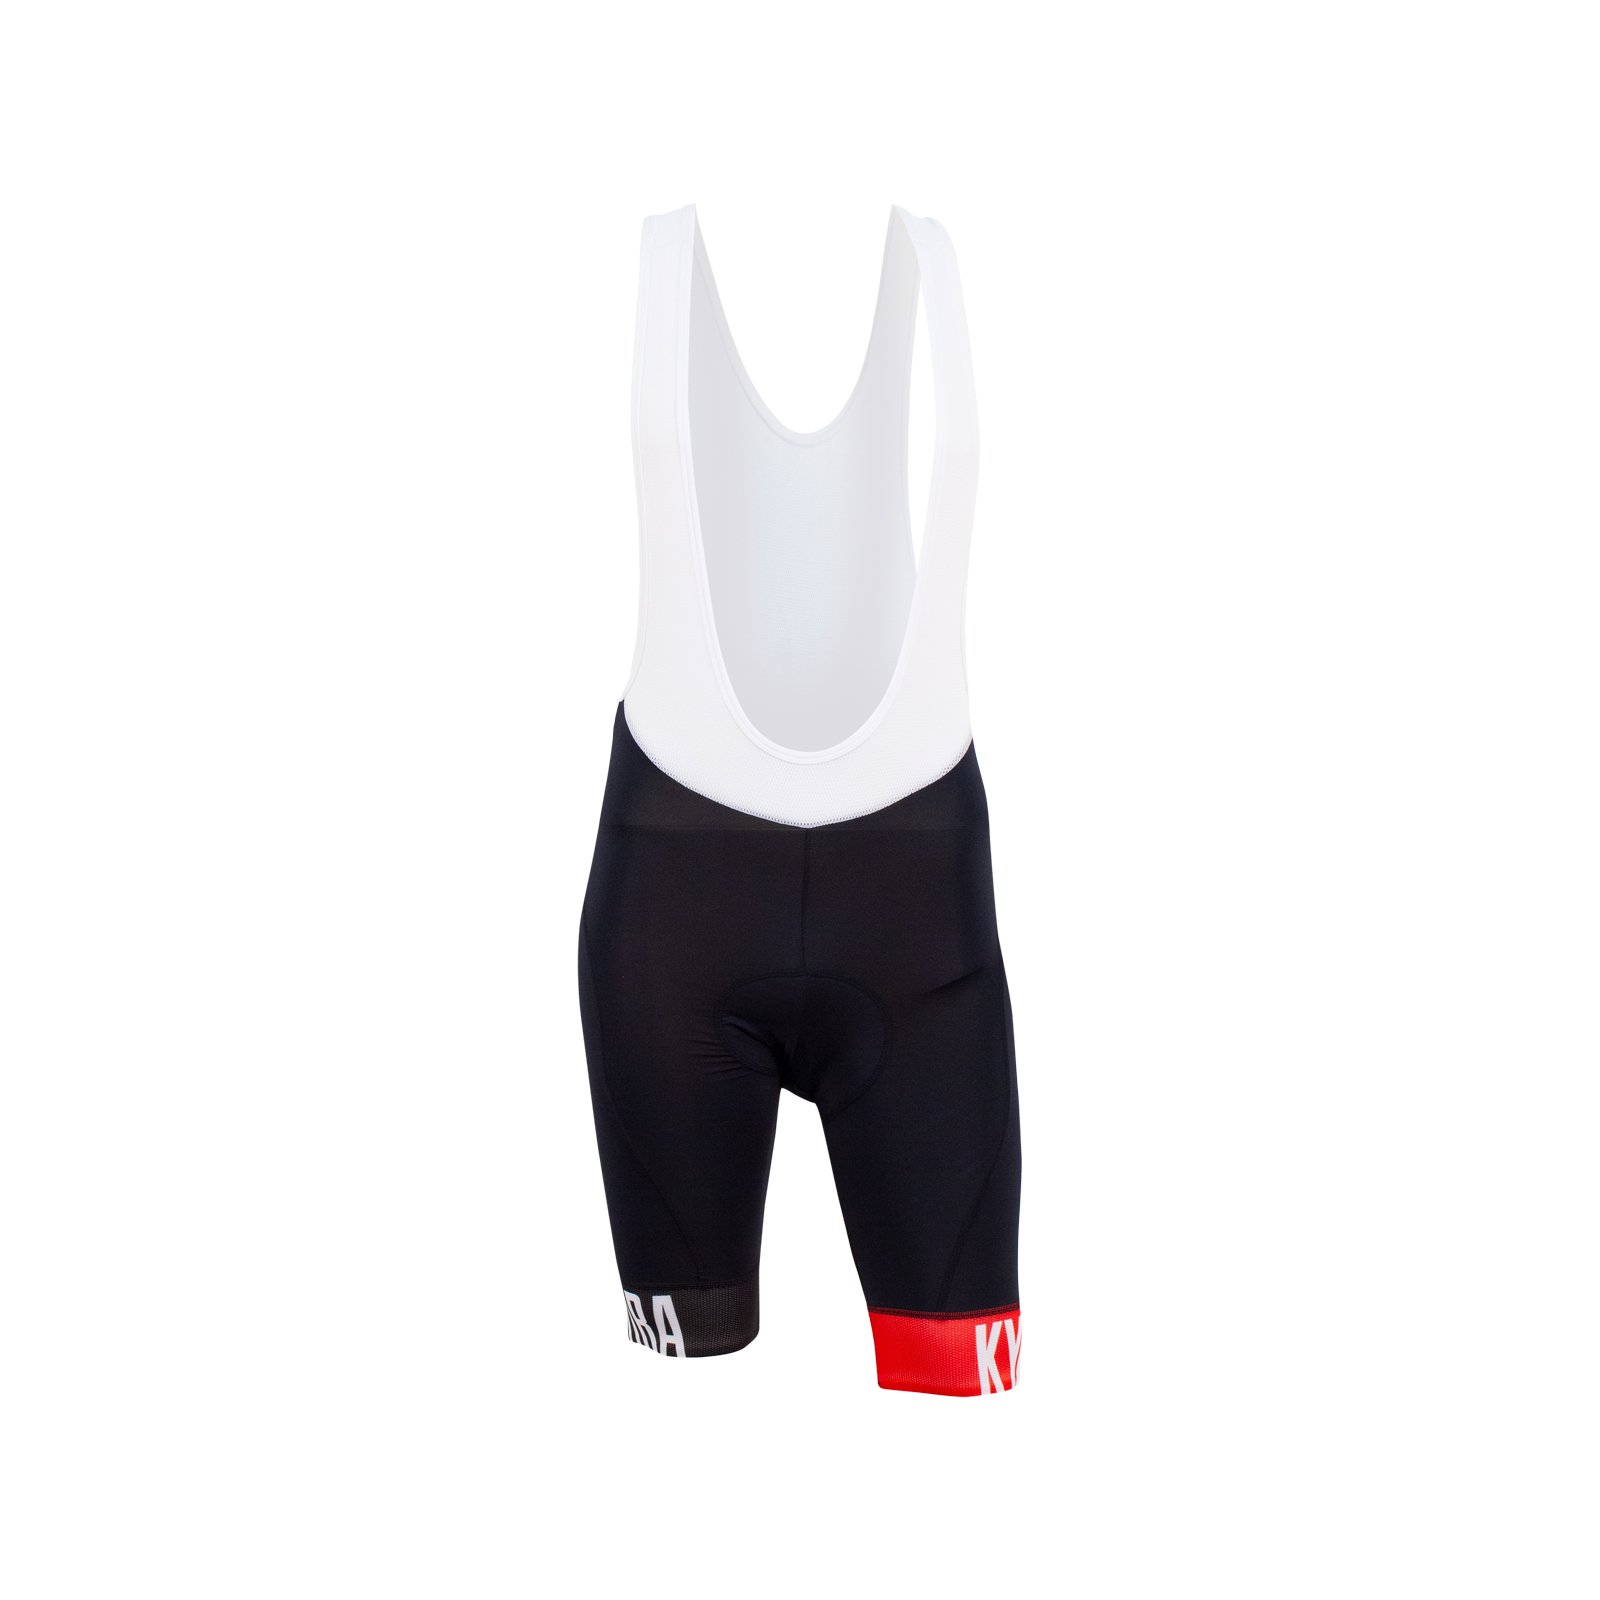 Onyx Bib Shorts // Black + Red (S) - KYMIRA Sport - Touch of